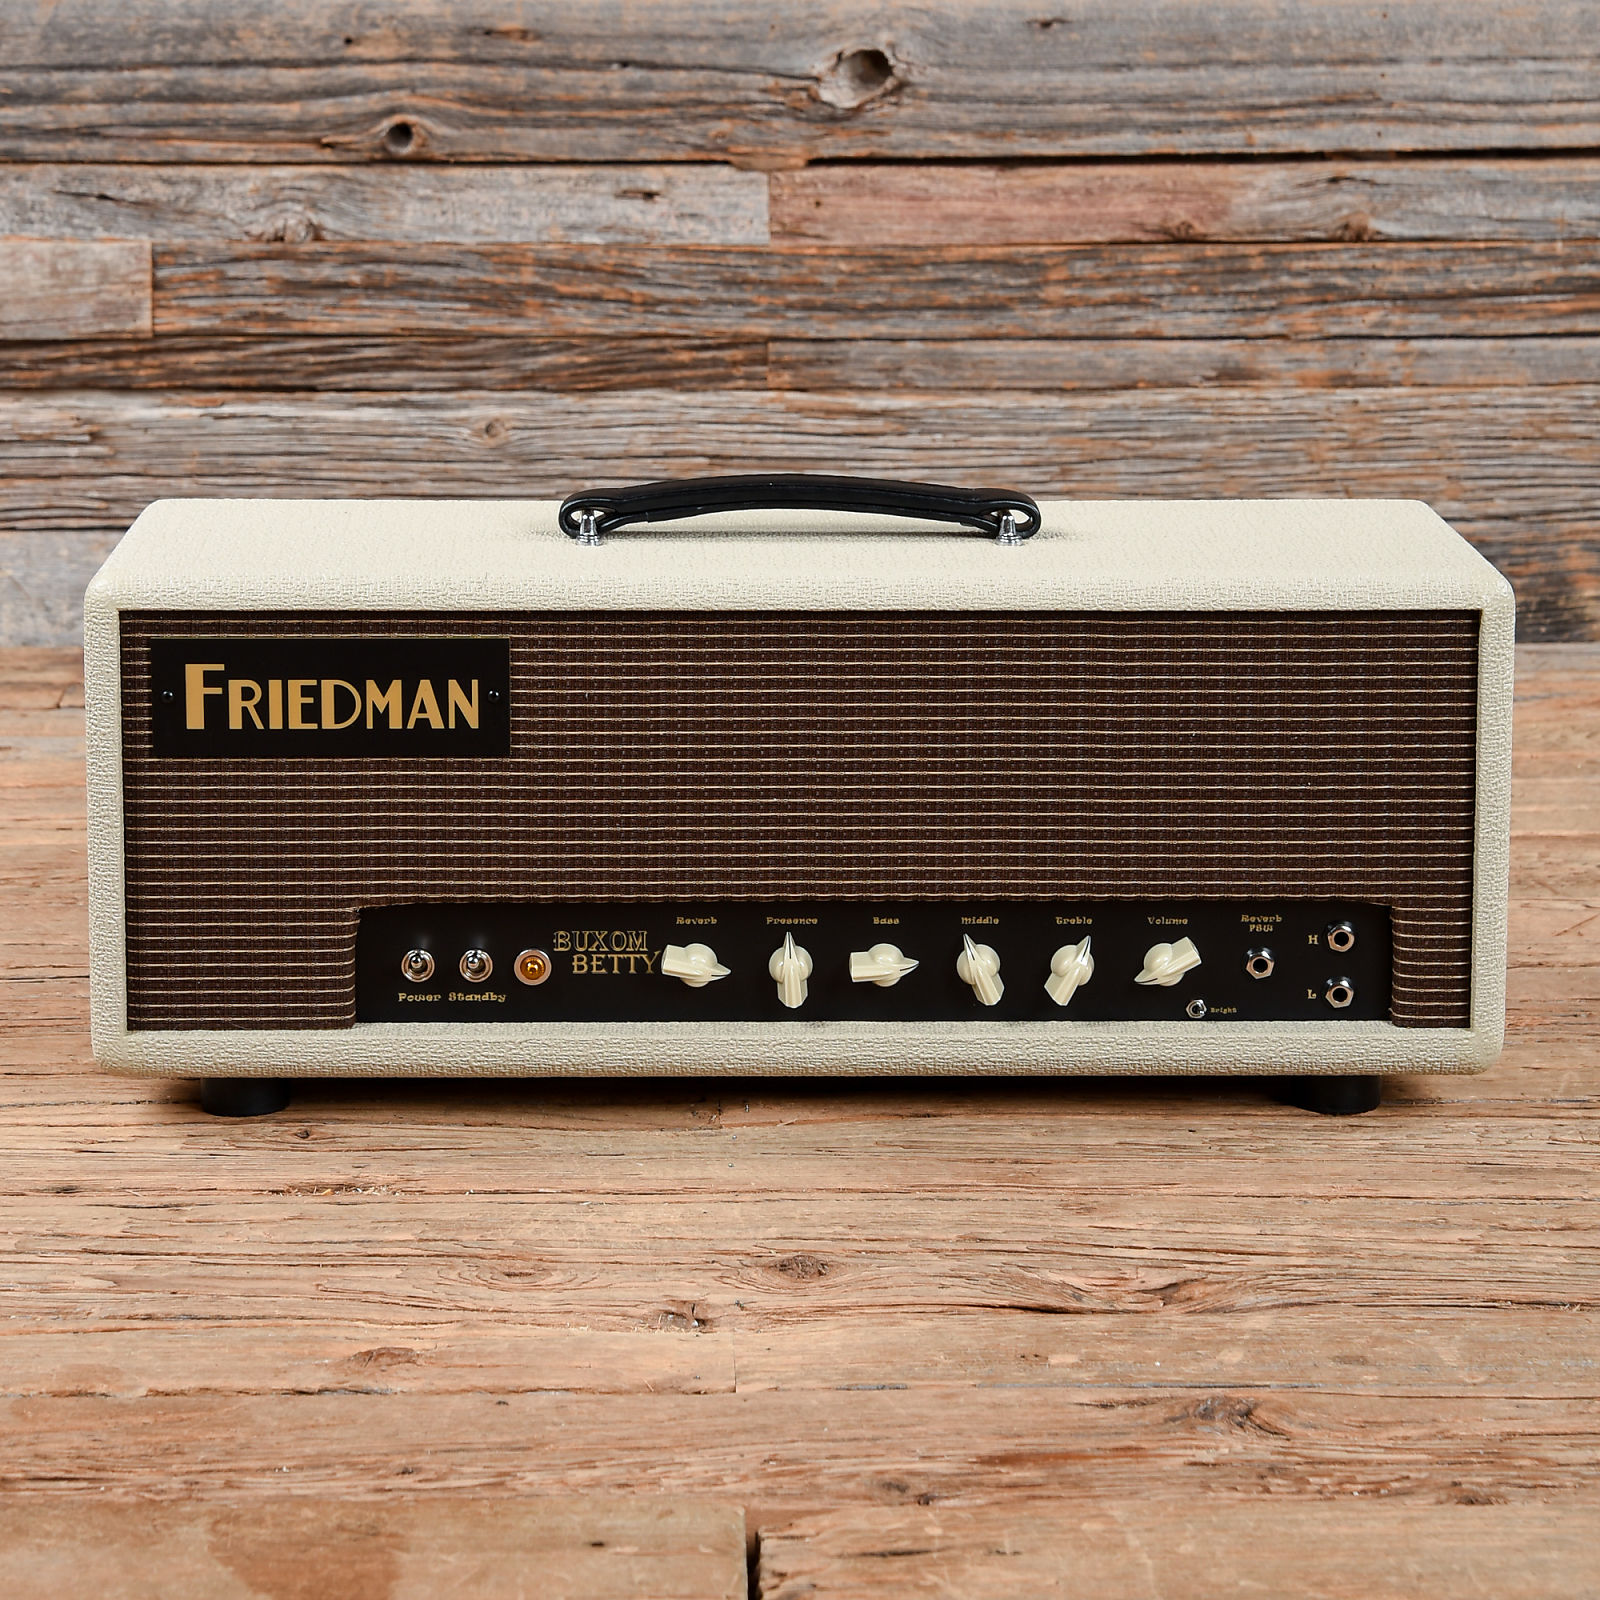 Friedman Buxom Betty 50w Head W Footswitch Used S117 20w Power Tube Amplifier With El34